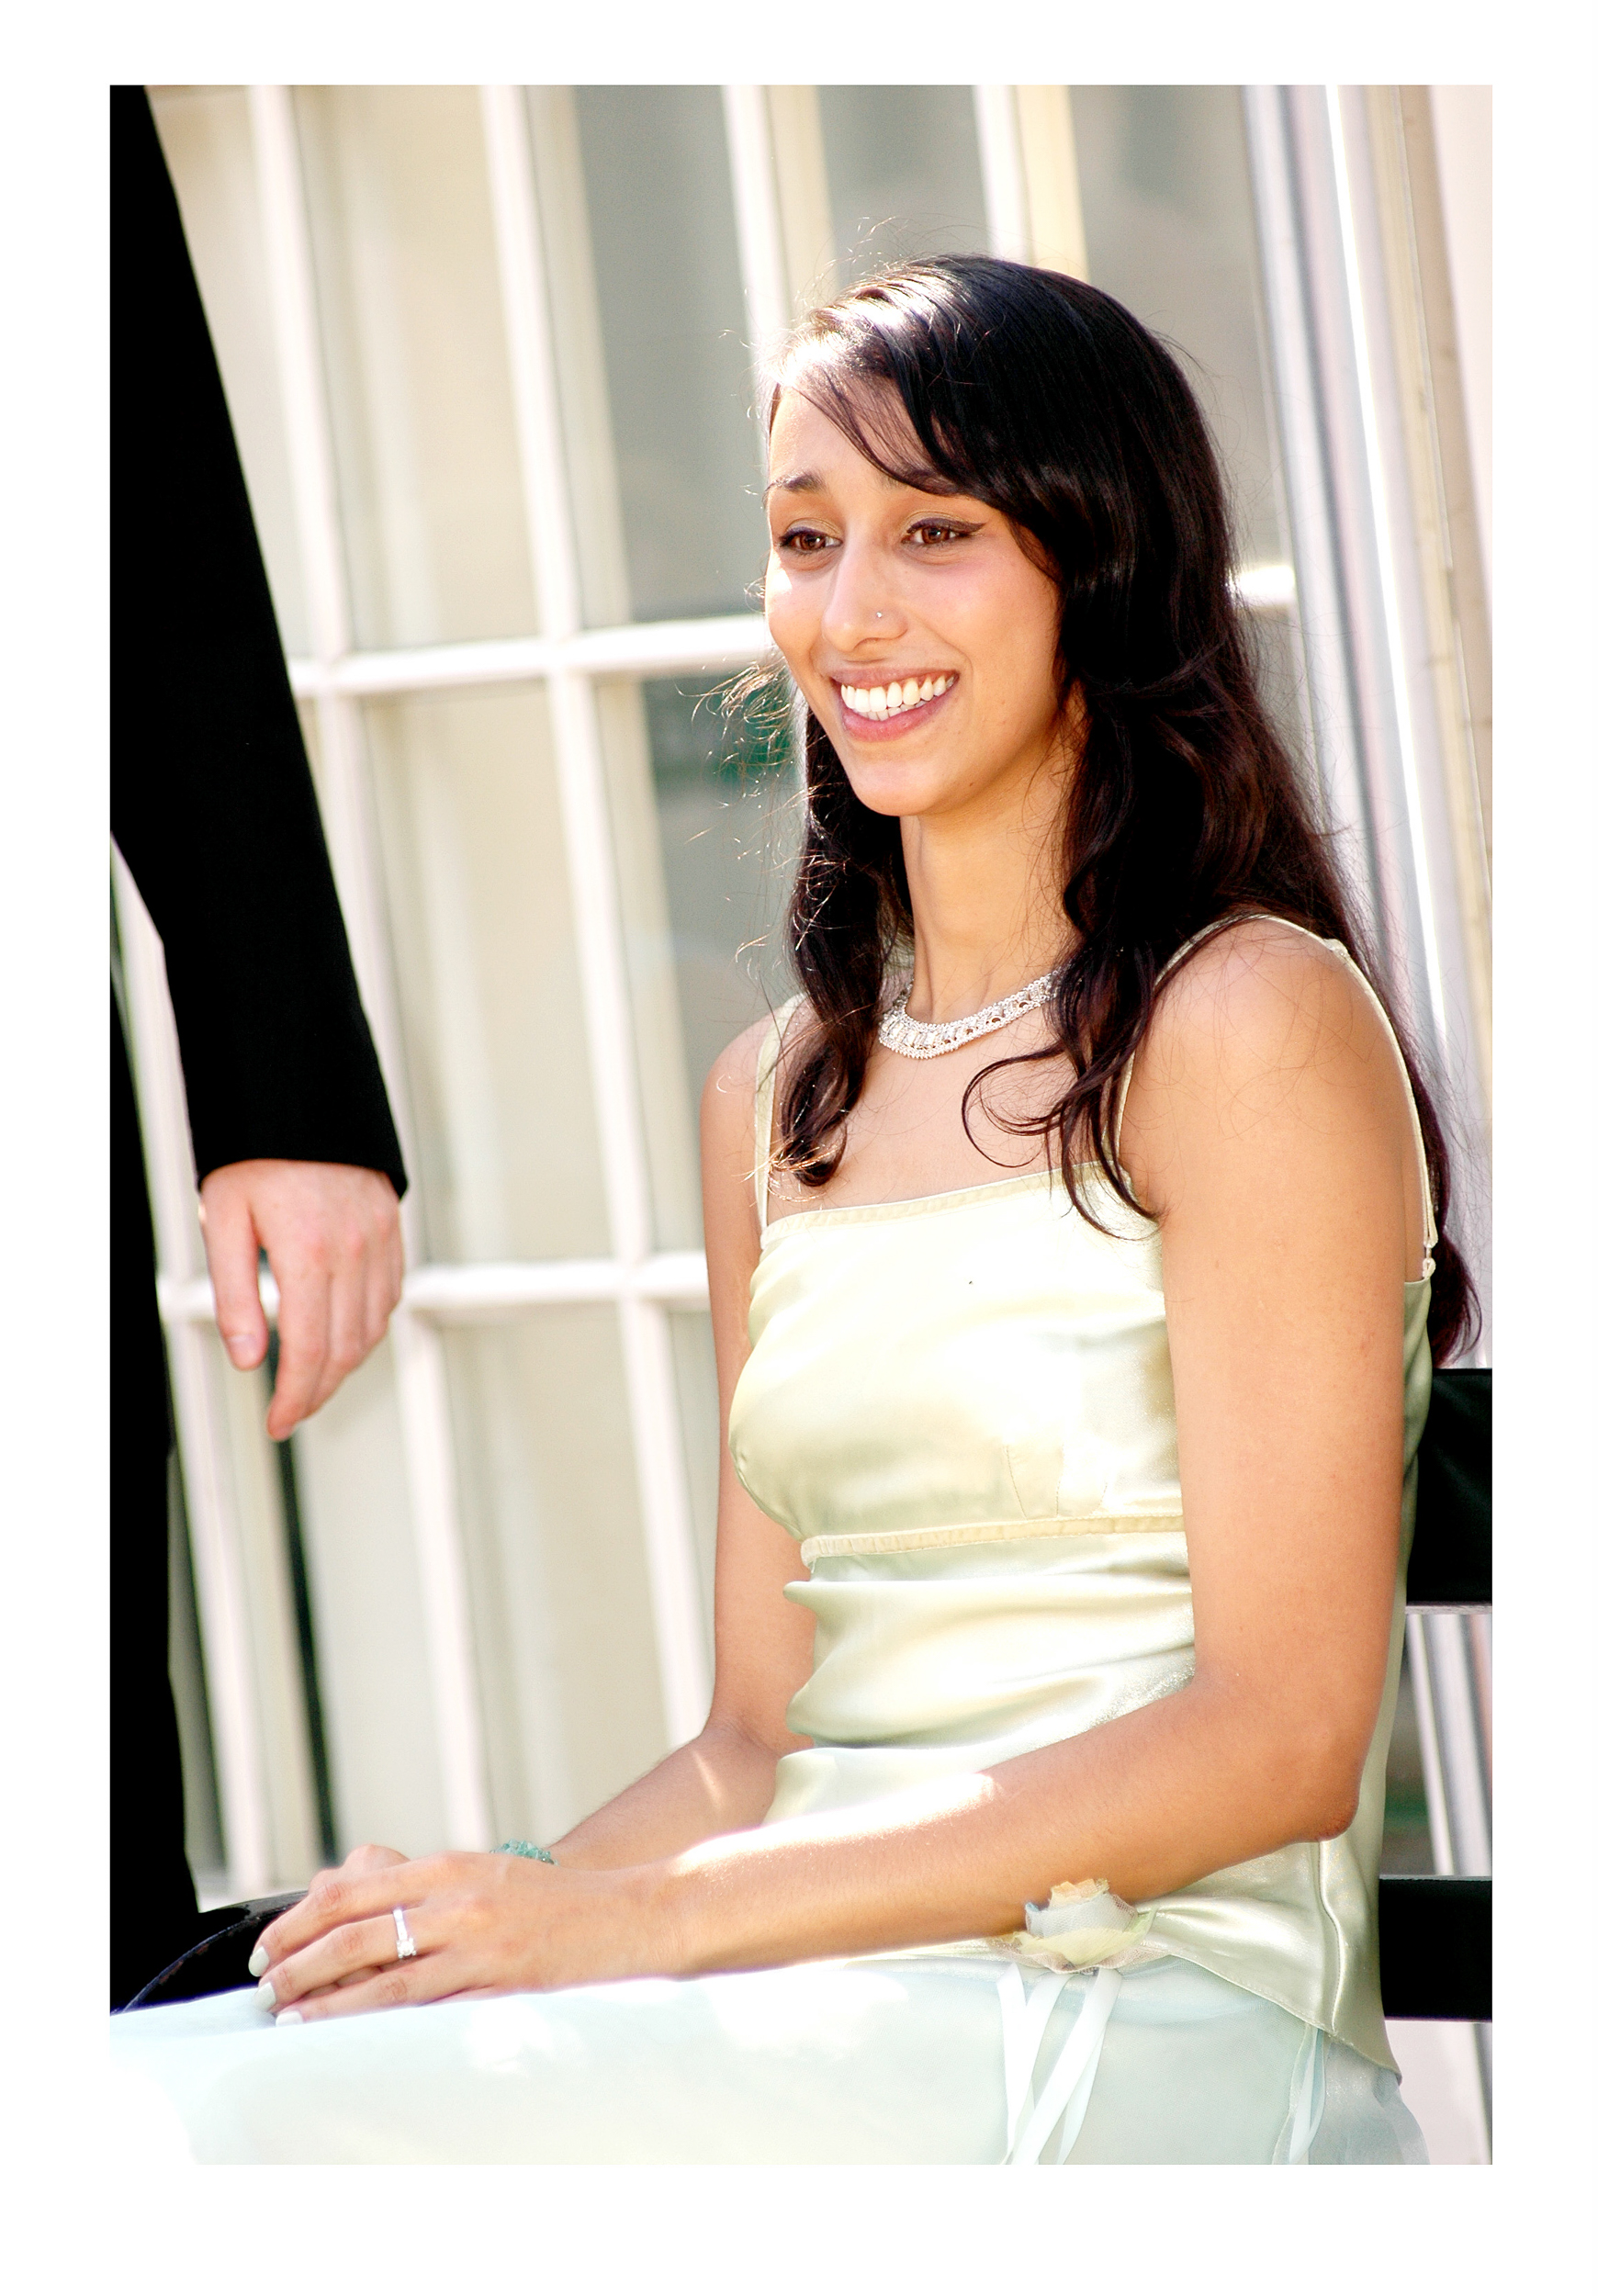 REPORTAGE-WEDDING-PHOTOGRAPHY-SET-UK-2.jpg